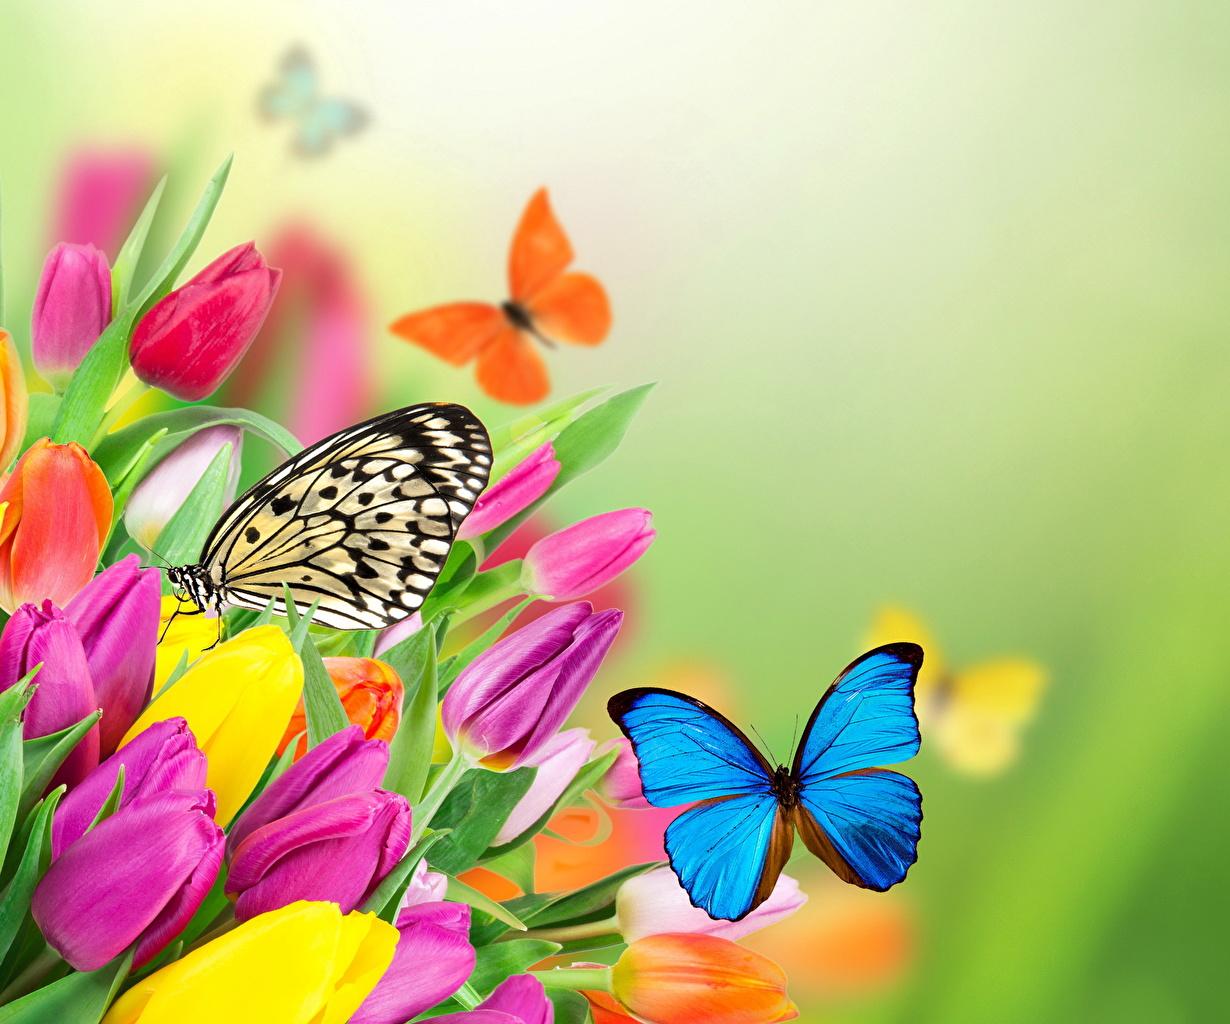 Картинка бабочка тюльпан Цветы Животные Бабочки Тюльпаны цветок животное